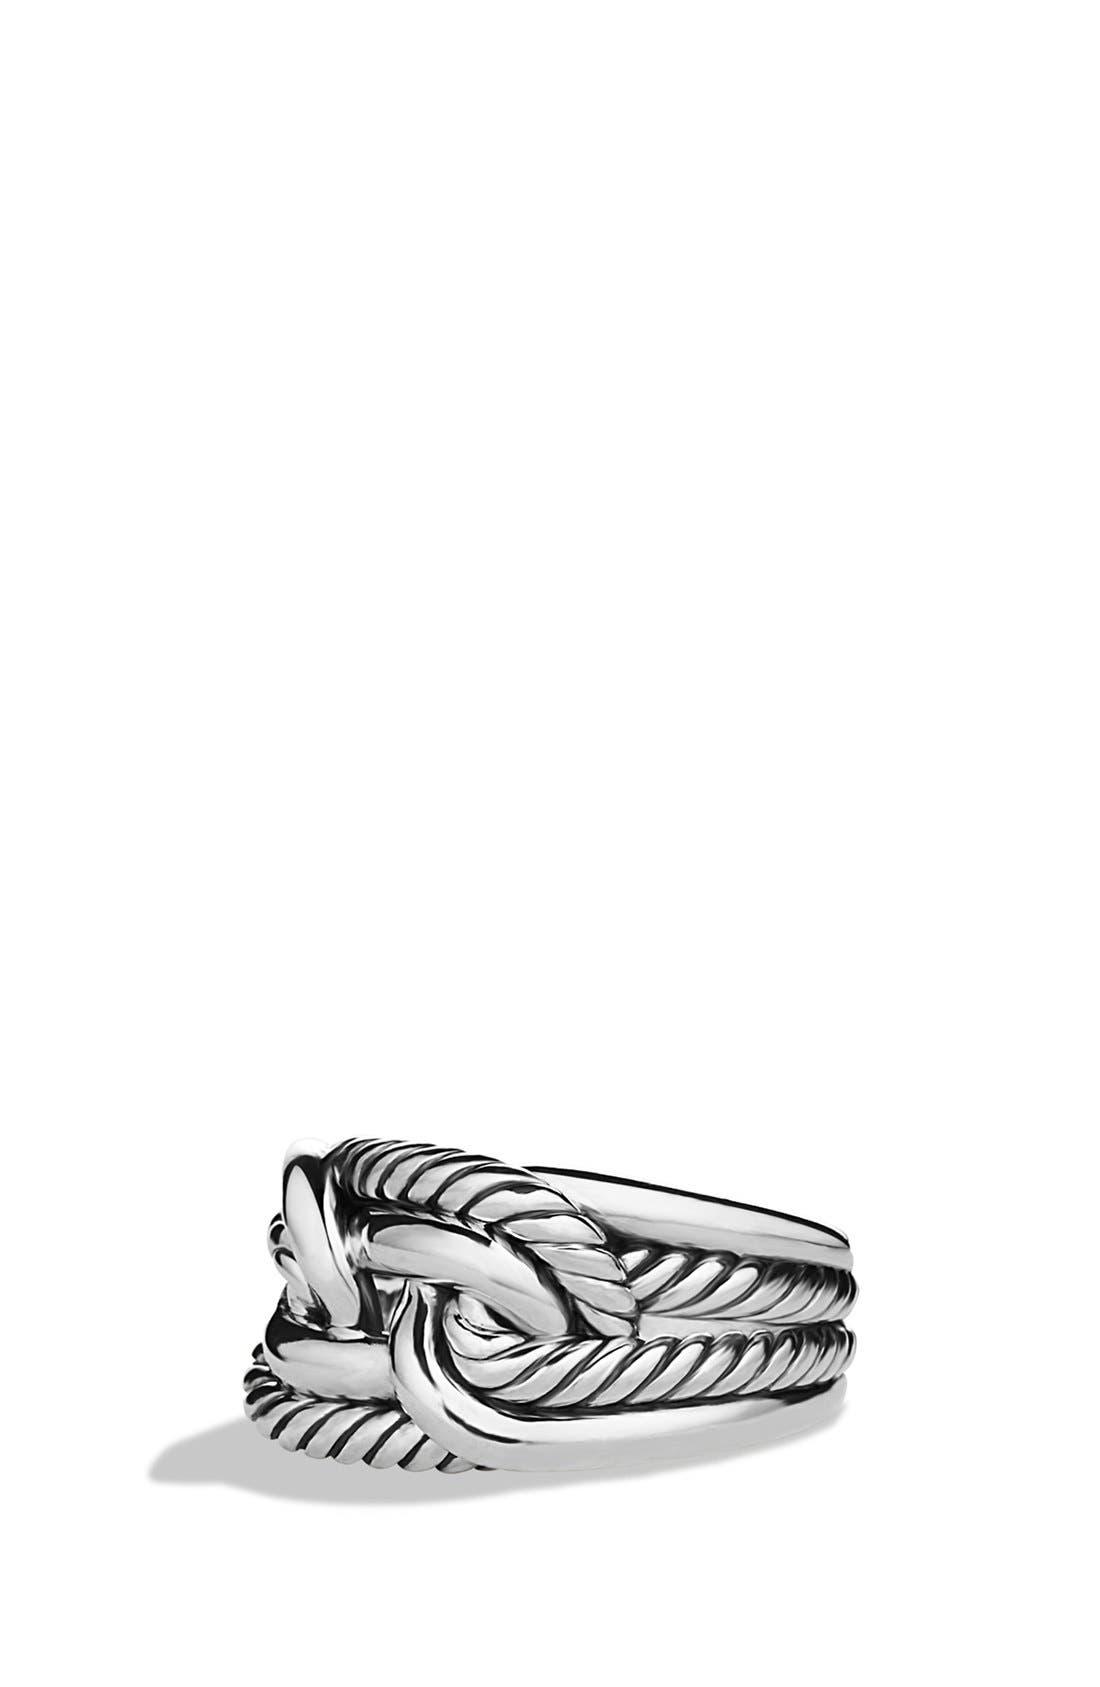 Main Image - David Yurman 'Labyrinth' Ring